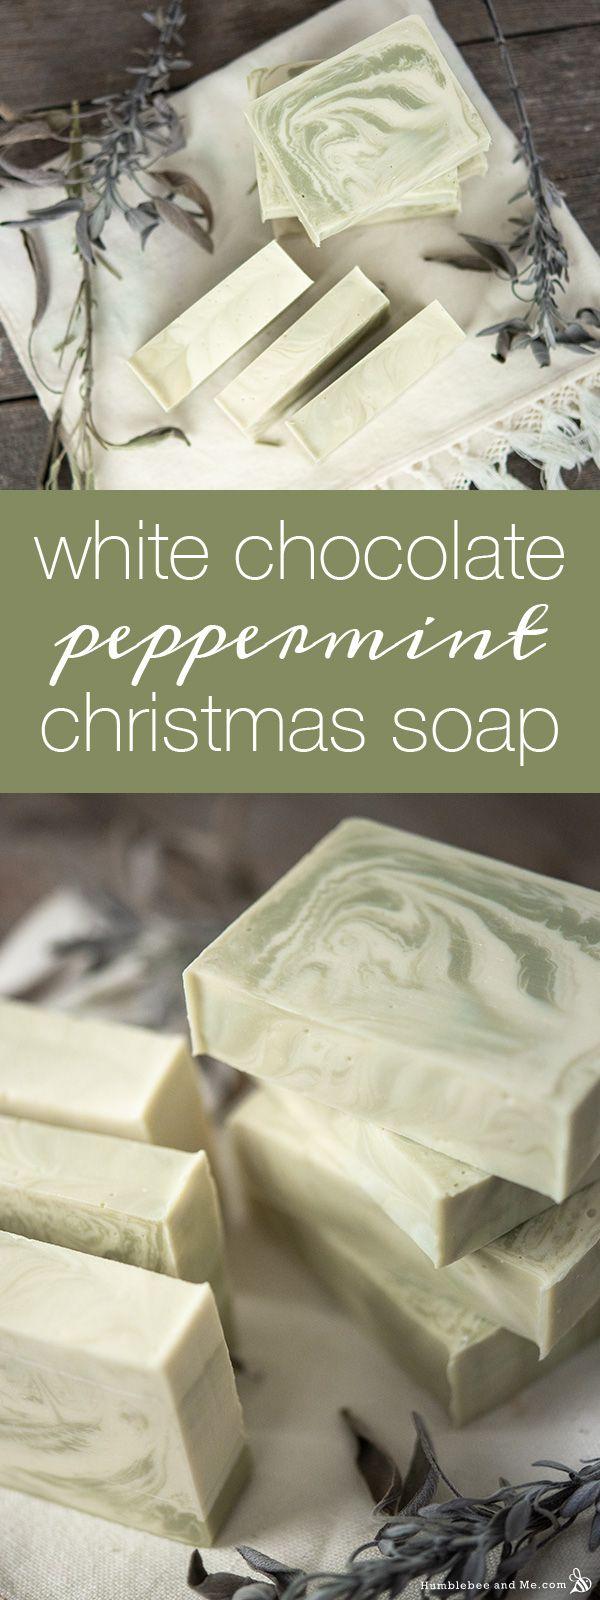 White Chocolate Peppermint Christmas Soap - Humblebee & Me